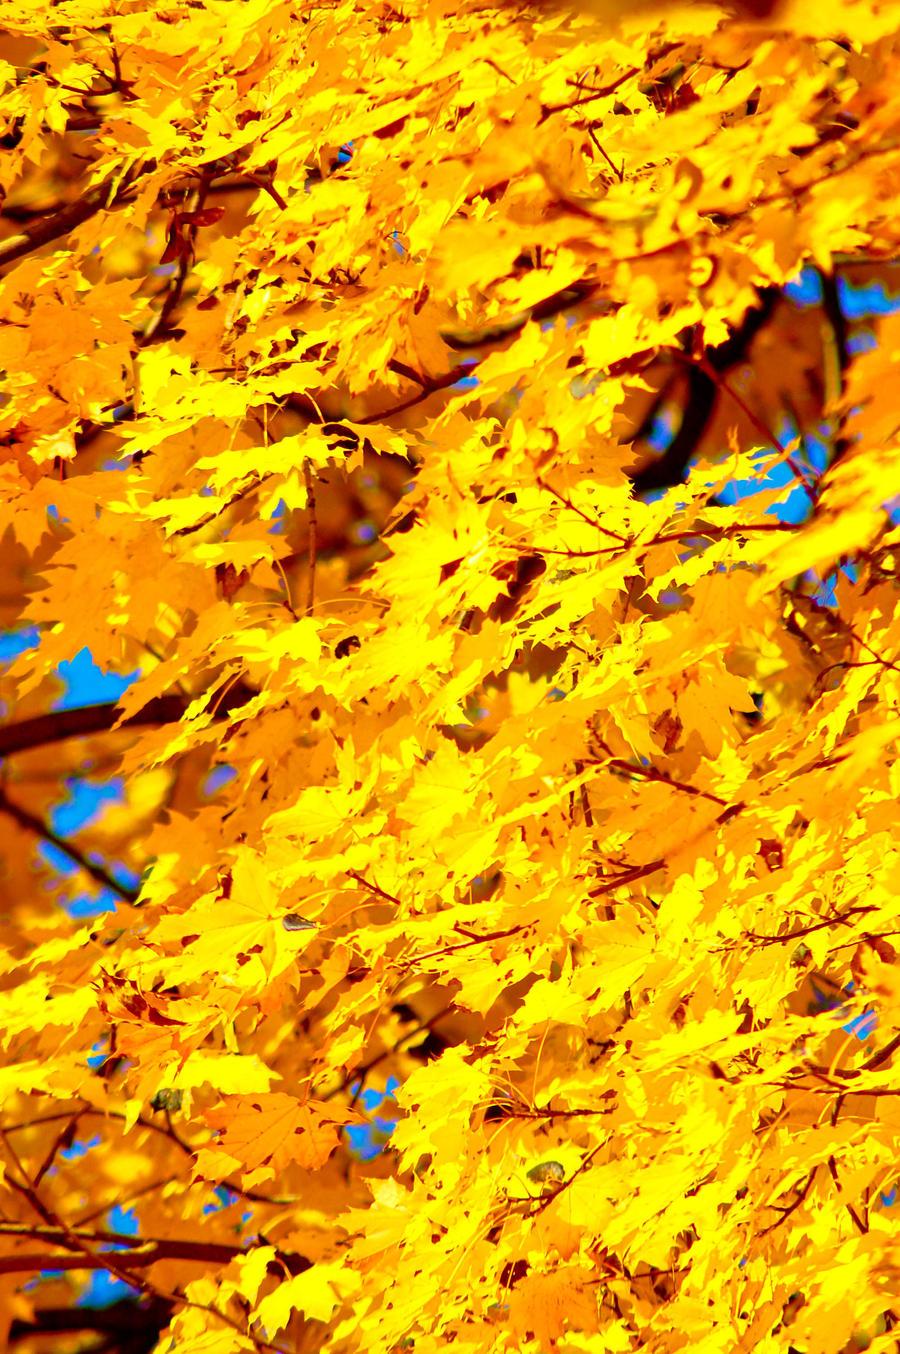 Foliage by Libayne